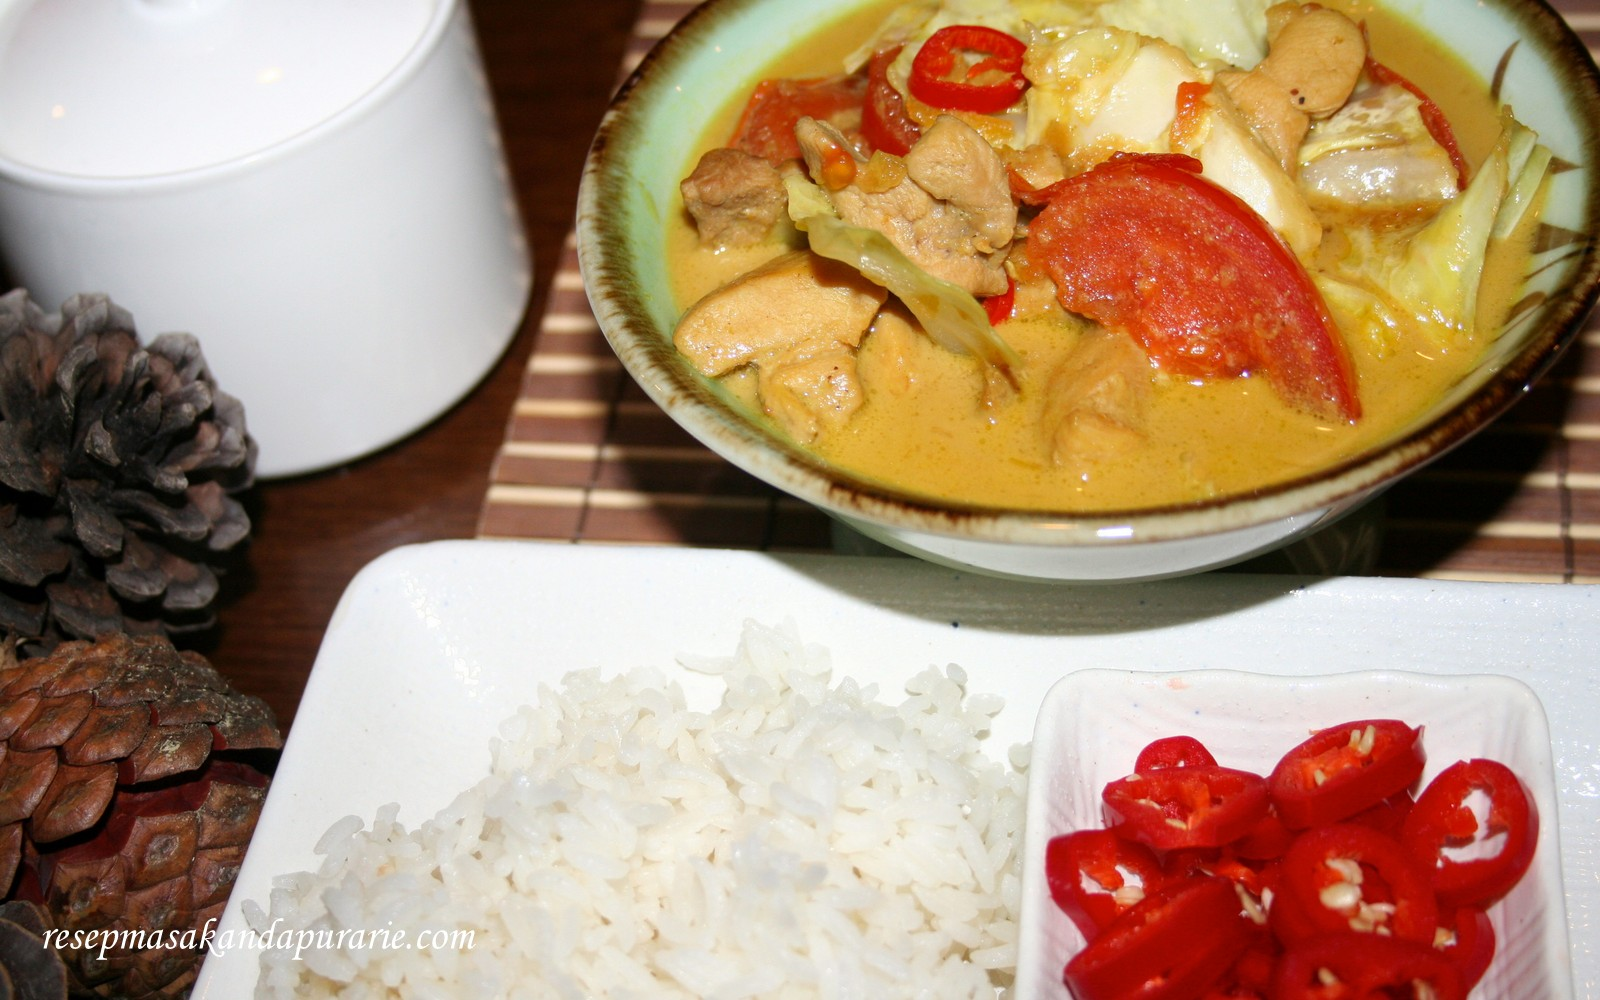 Resep cara membuat tongseng ayam enak dan mudah resep masakan dapur